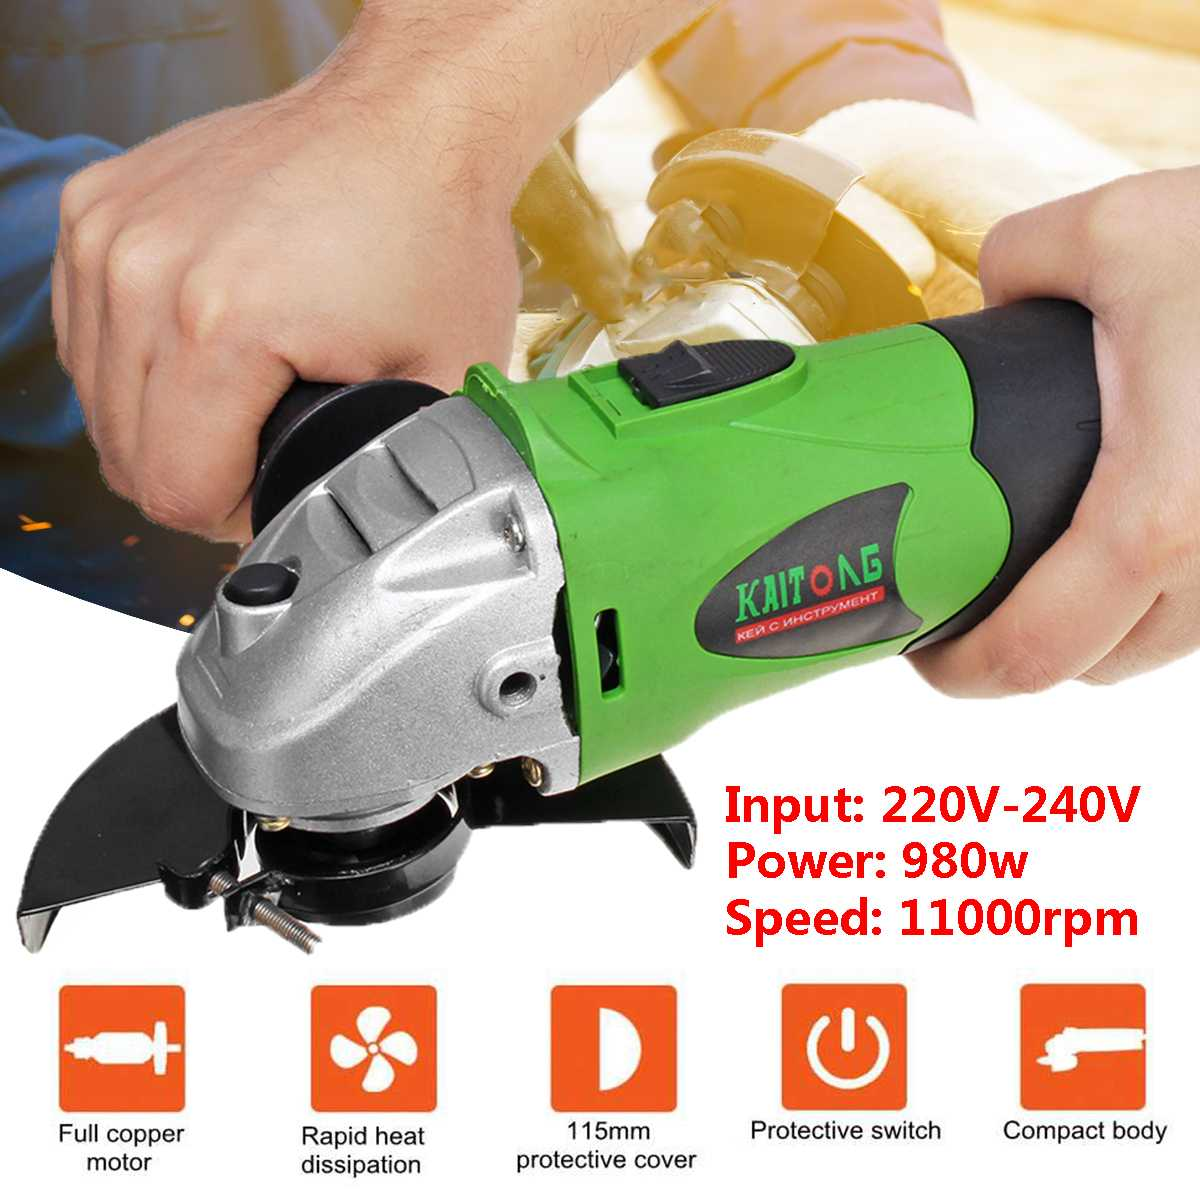 Metal Cutting Tool 980W Electric Angle Grinder 115 125mm Grinding Machine 11000RPM Adjustable Anti Slip EU PLug Powerful Protect